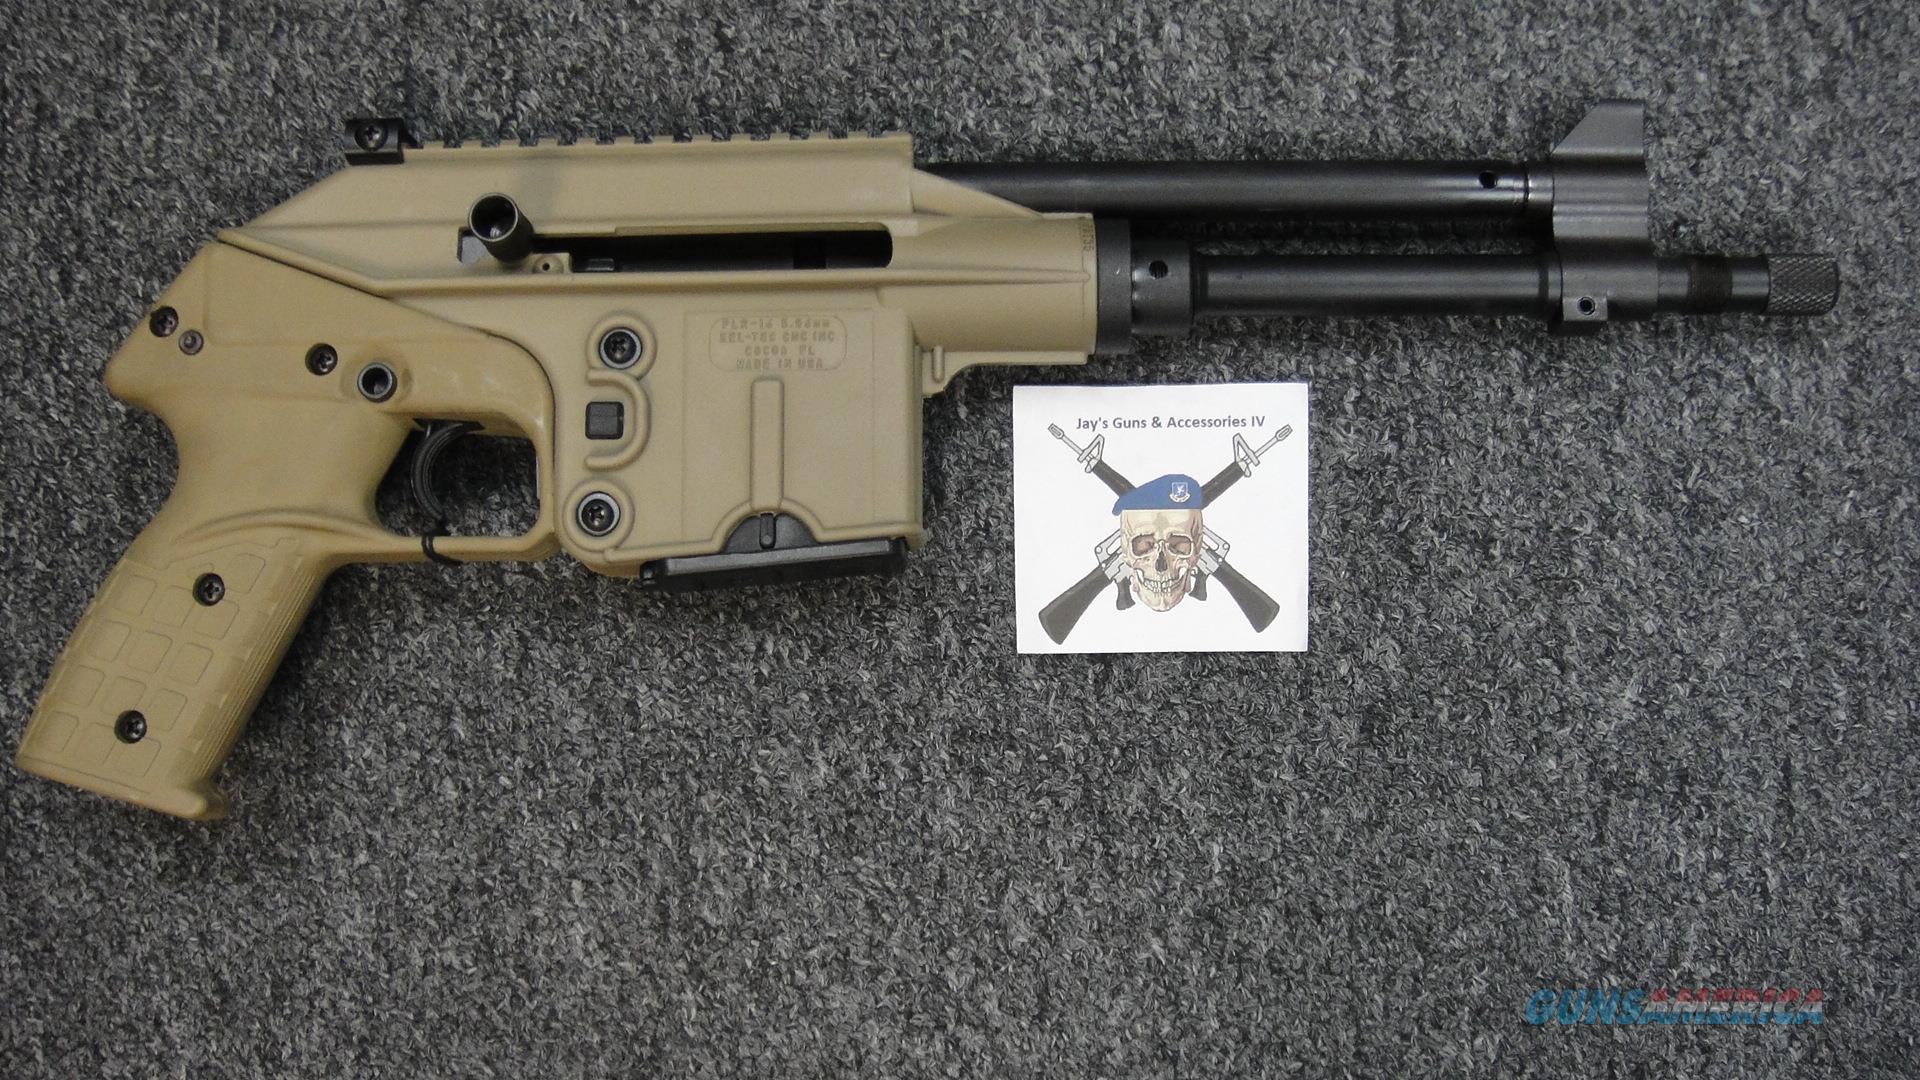 Kel-Tec PLR-16 w/FDE Finish  Guns > Pistols > Kel-Tec Pistols > .223 Type